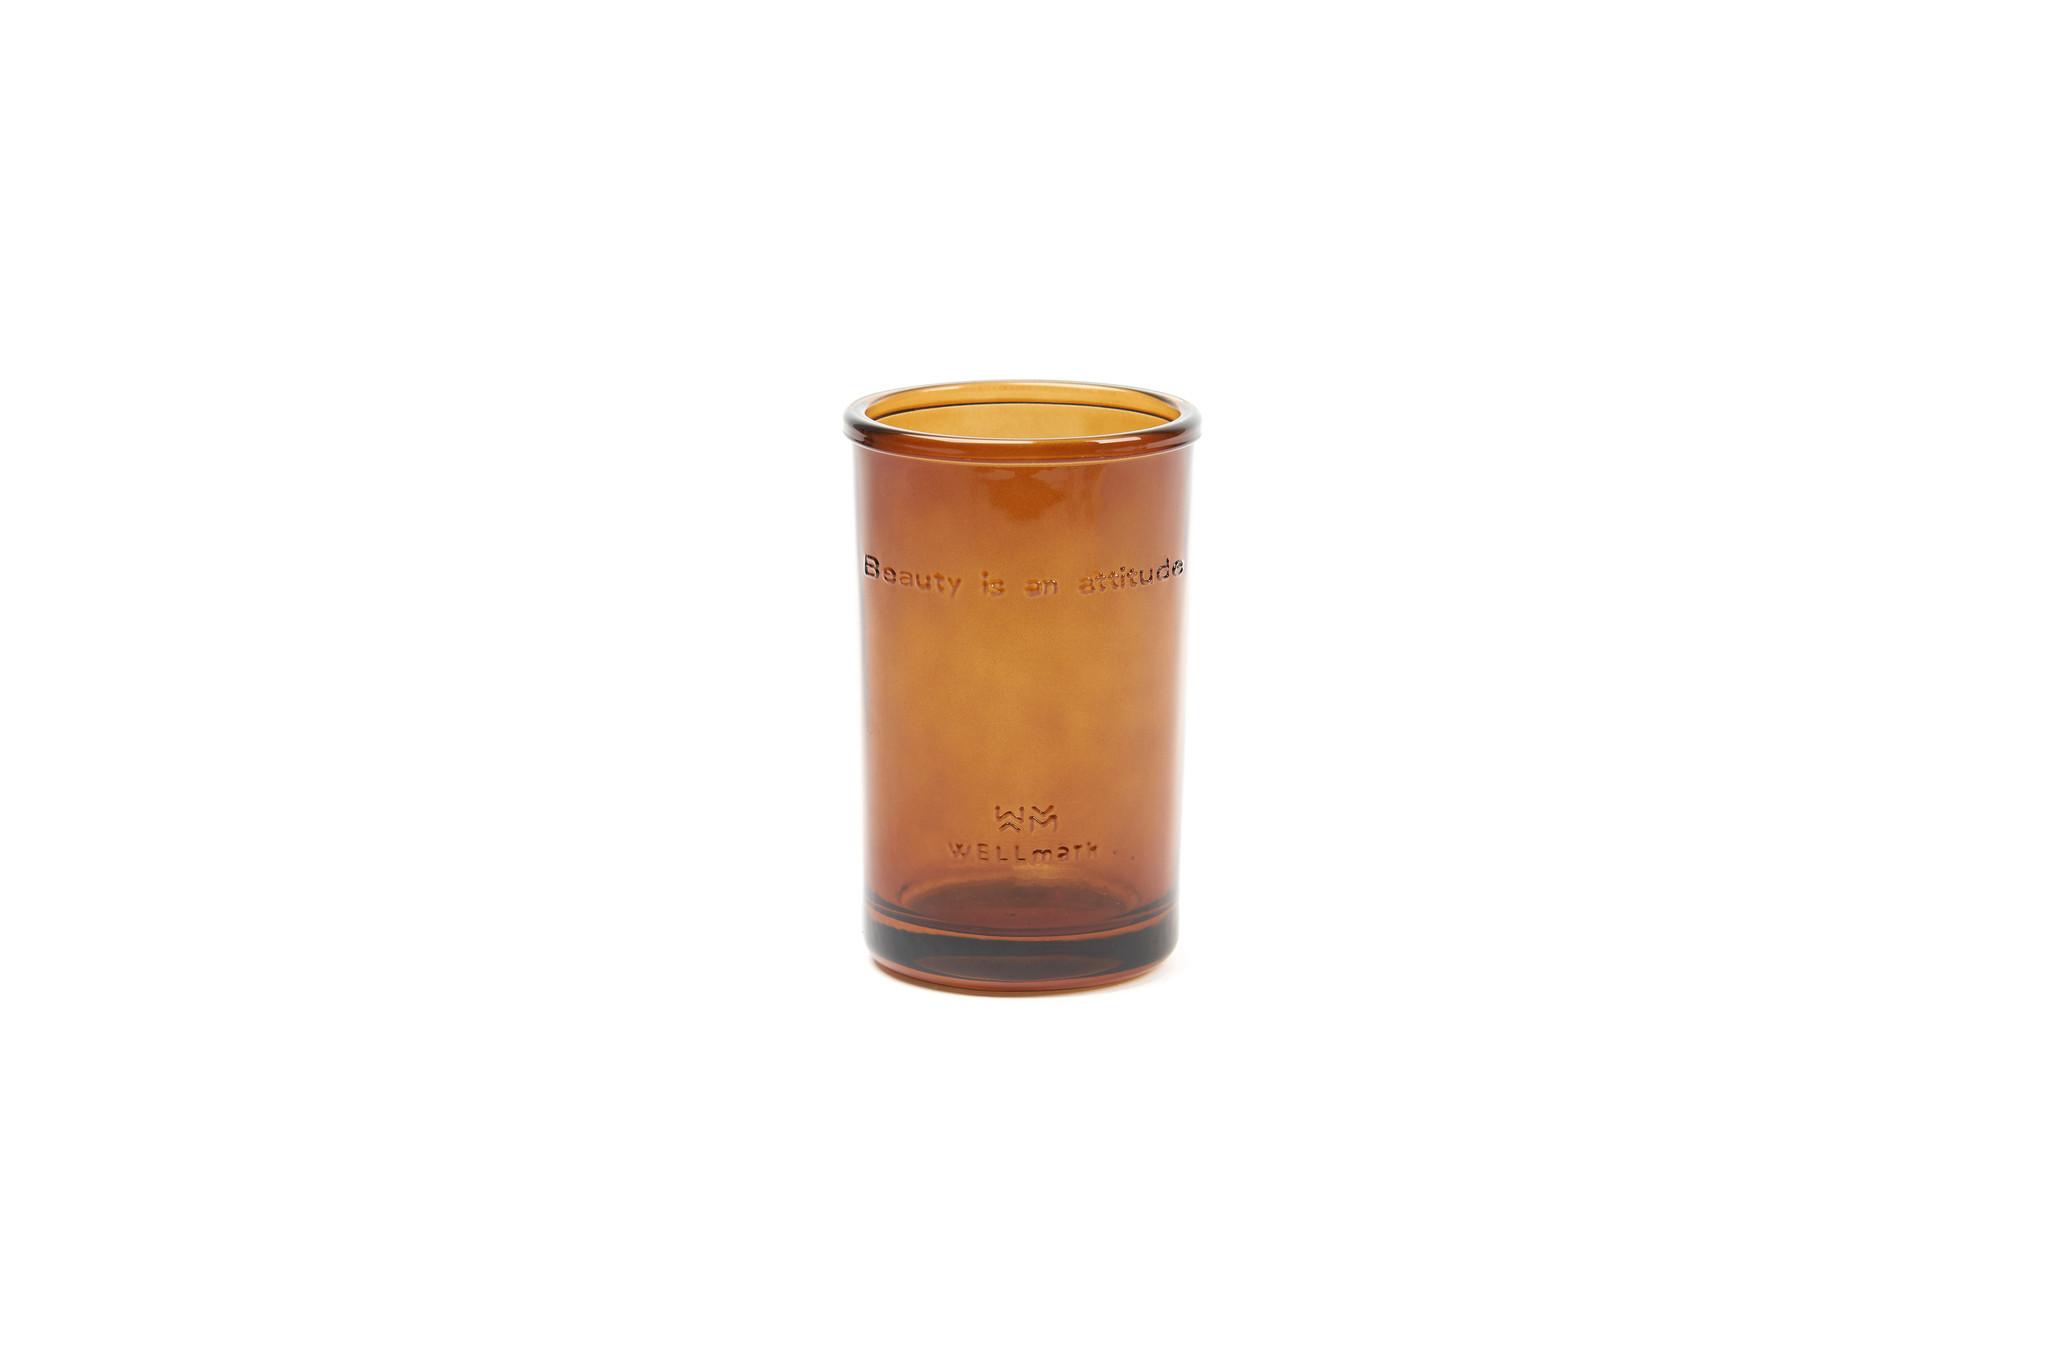 Tandenborstelhouder bruin glas 'Beauty is an attitude'-1